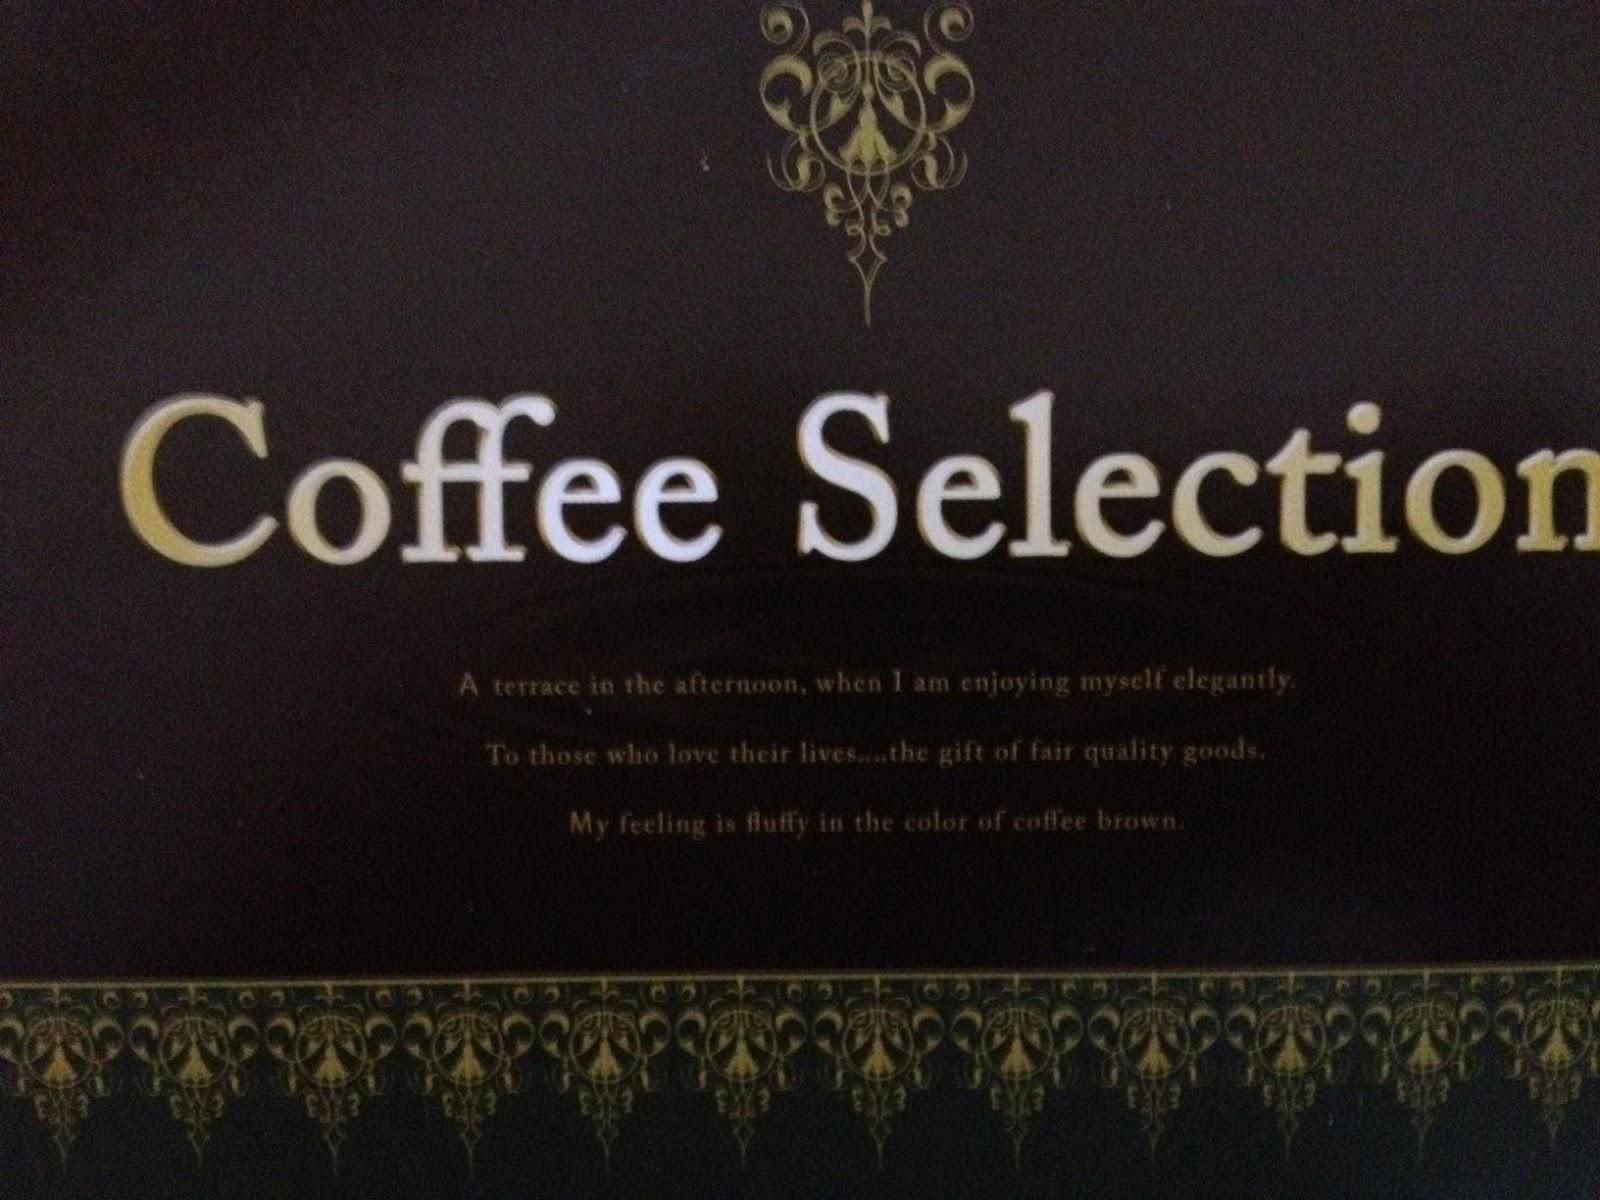 Kaiyo no gaijin the color of coffee brown for Terrace in a sentence